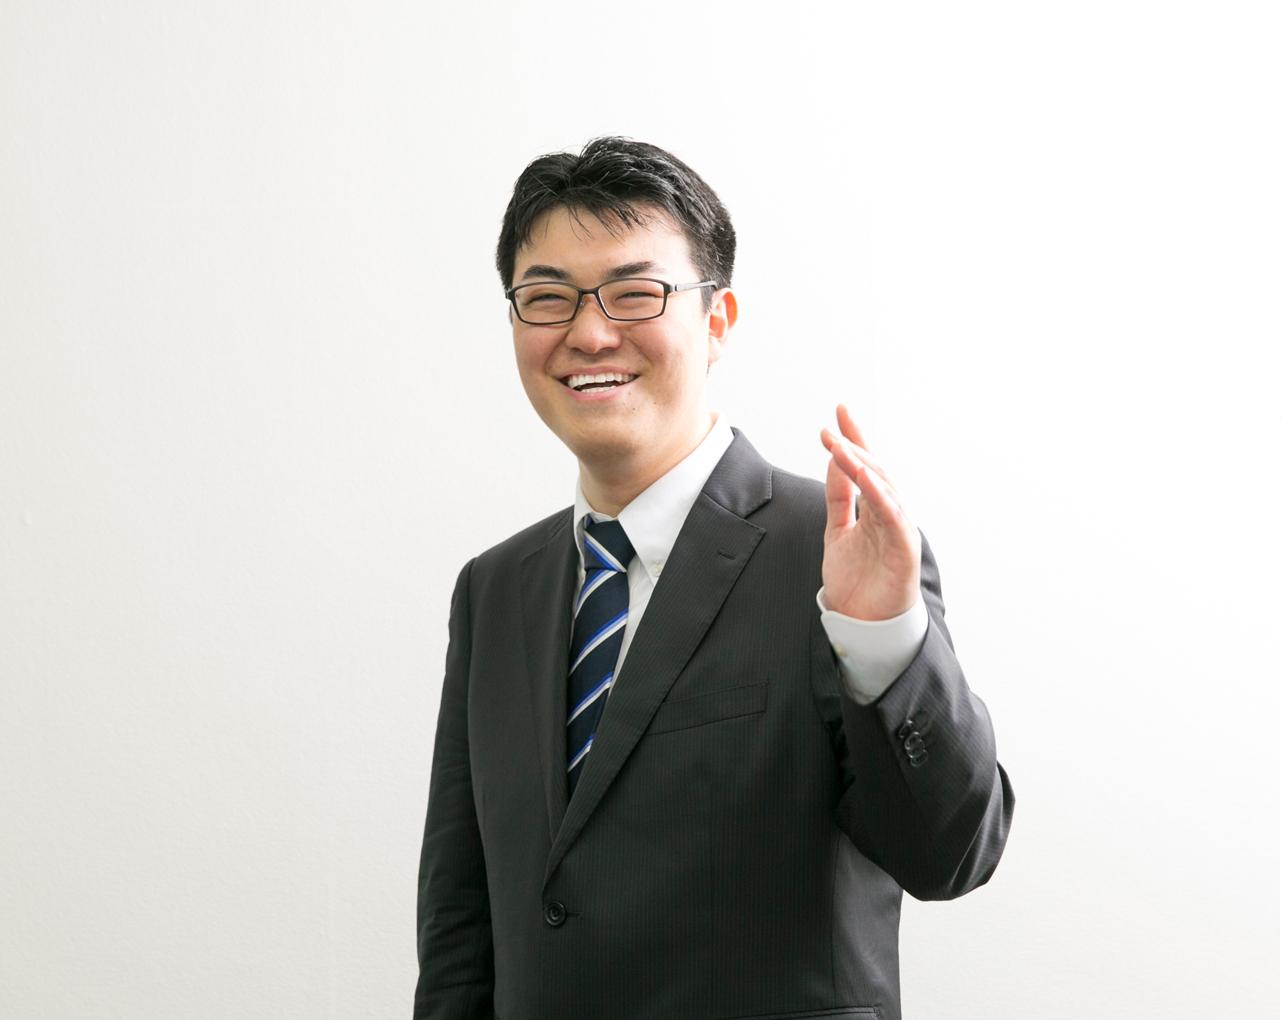 jitsukawa2